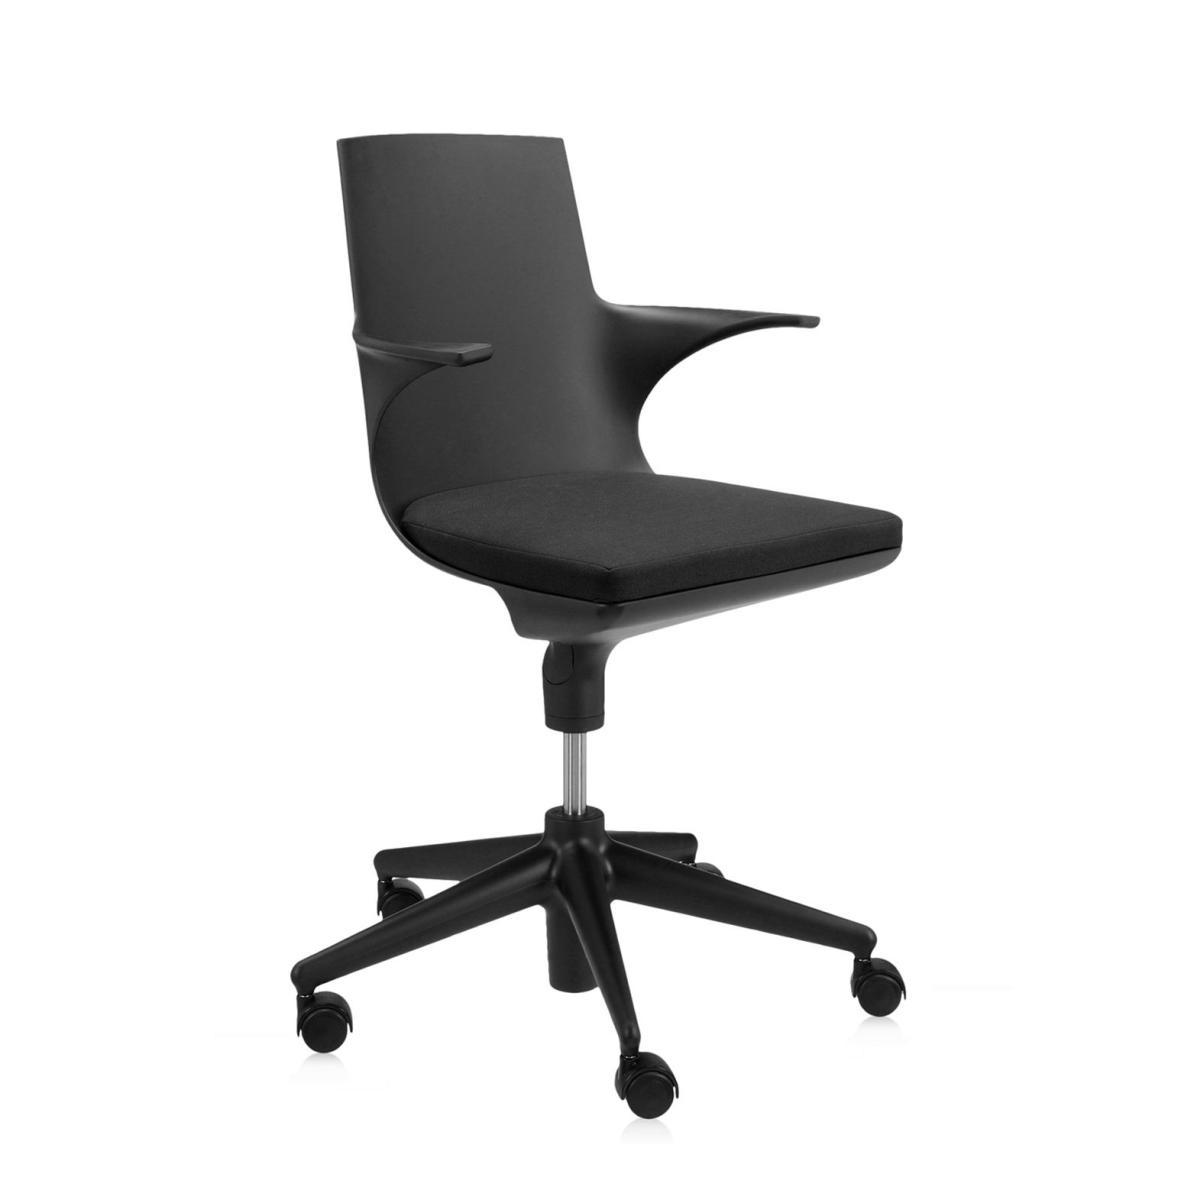 Spoon Chair Drehstuhl schwarz